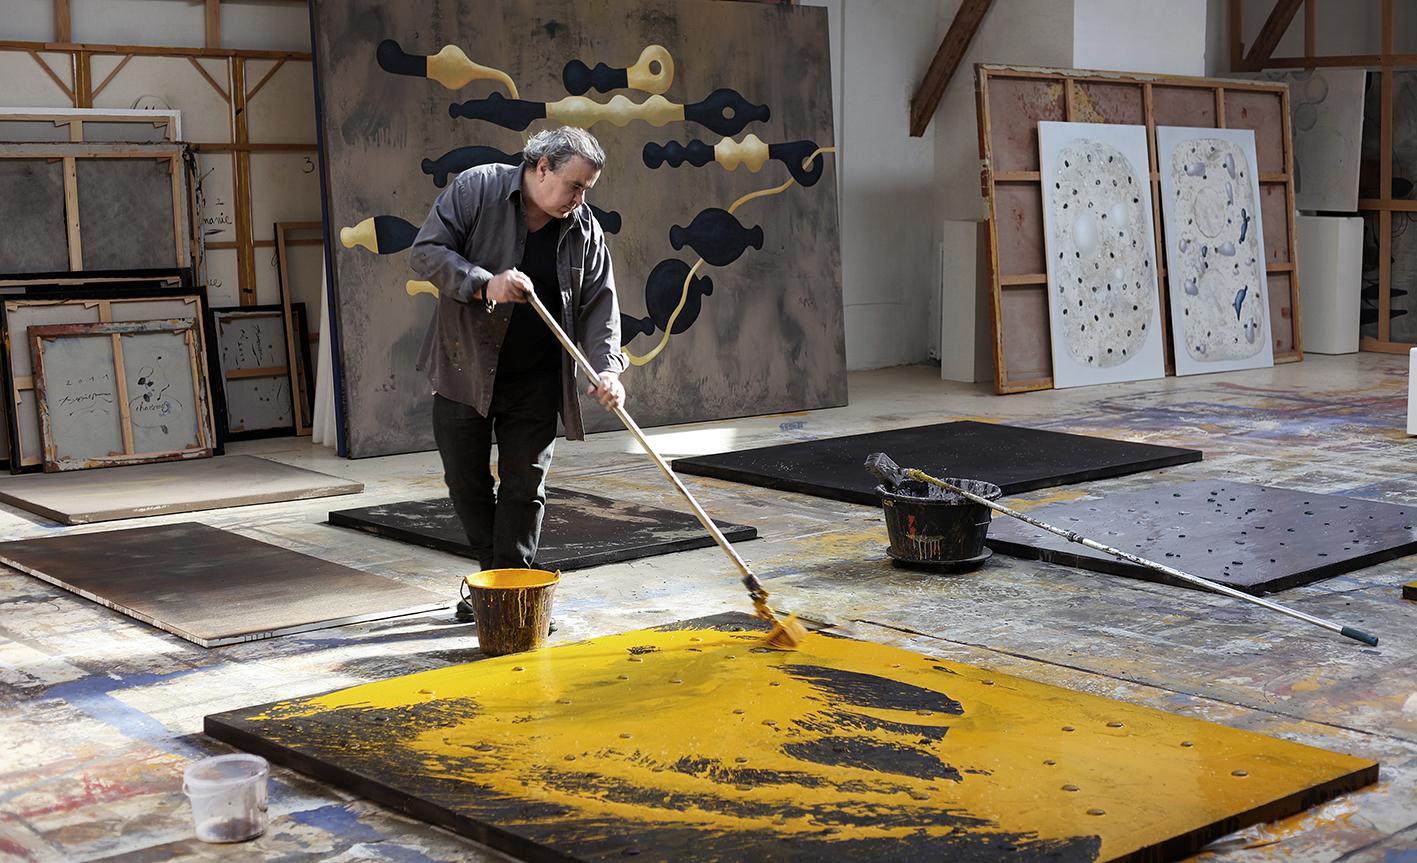 Richard-Texier-Artist-Art-Gallery-Portrait-Tannery-Studio-Paris-2013.jpg